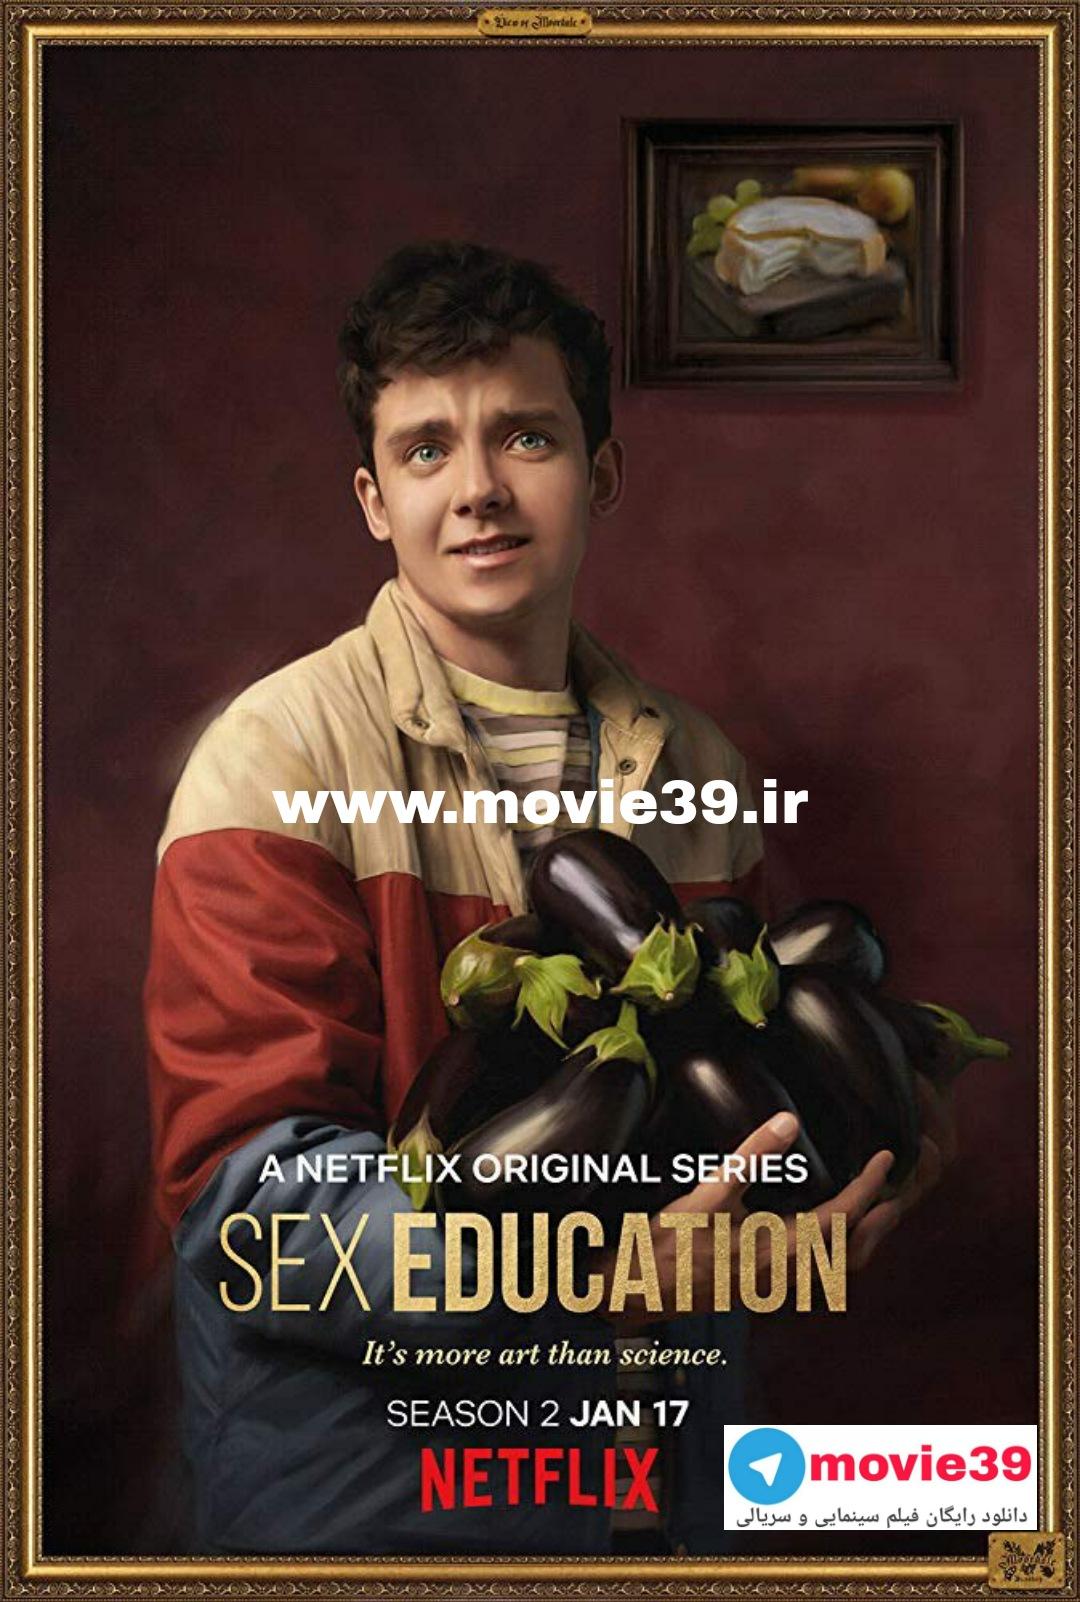 Sex education 2020